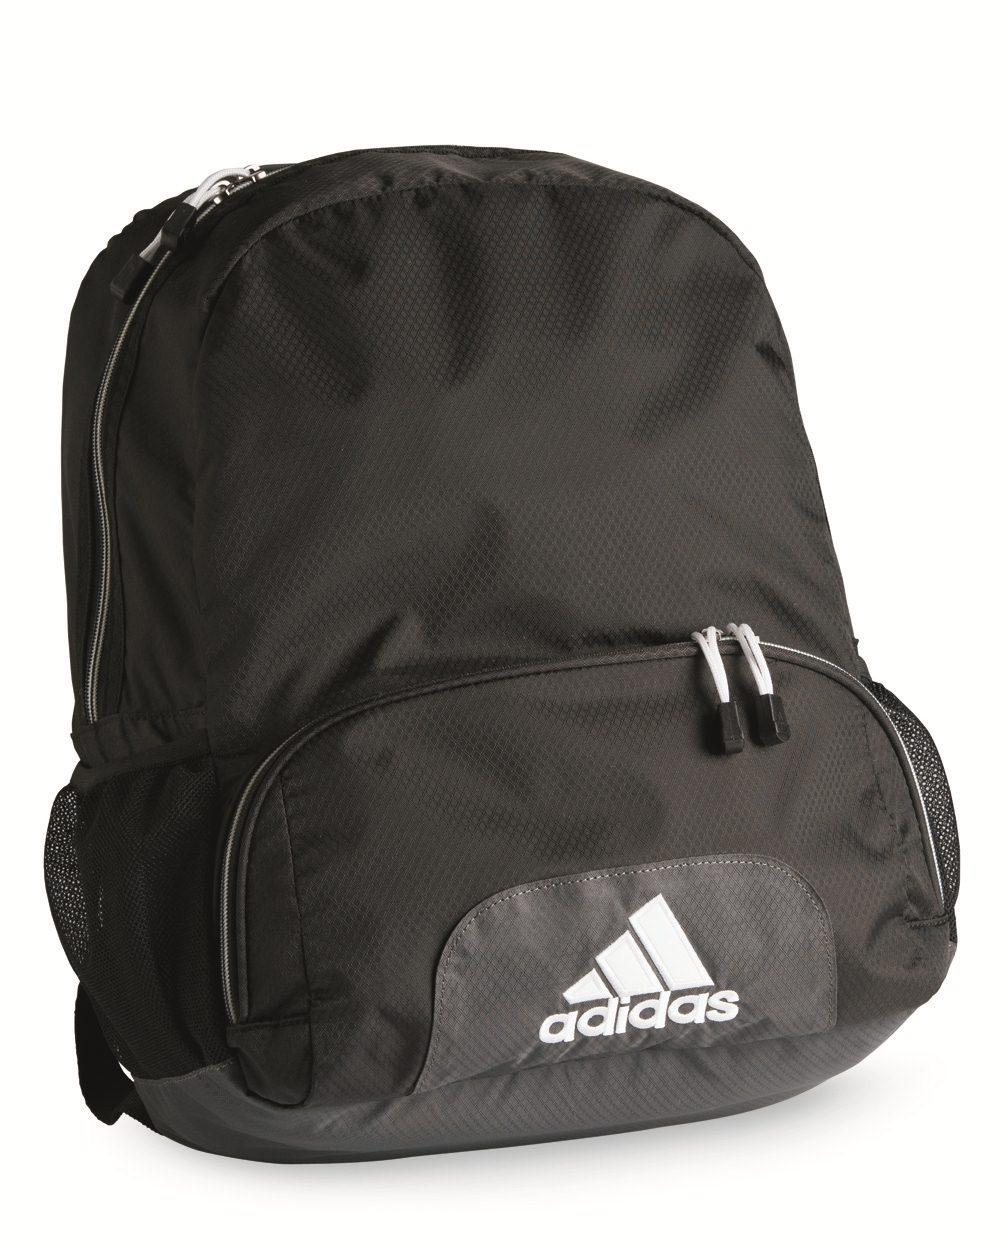 adidas University Backpack - A5702